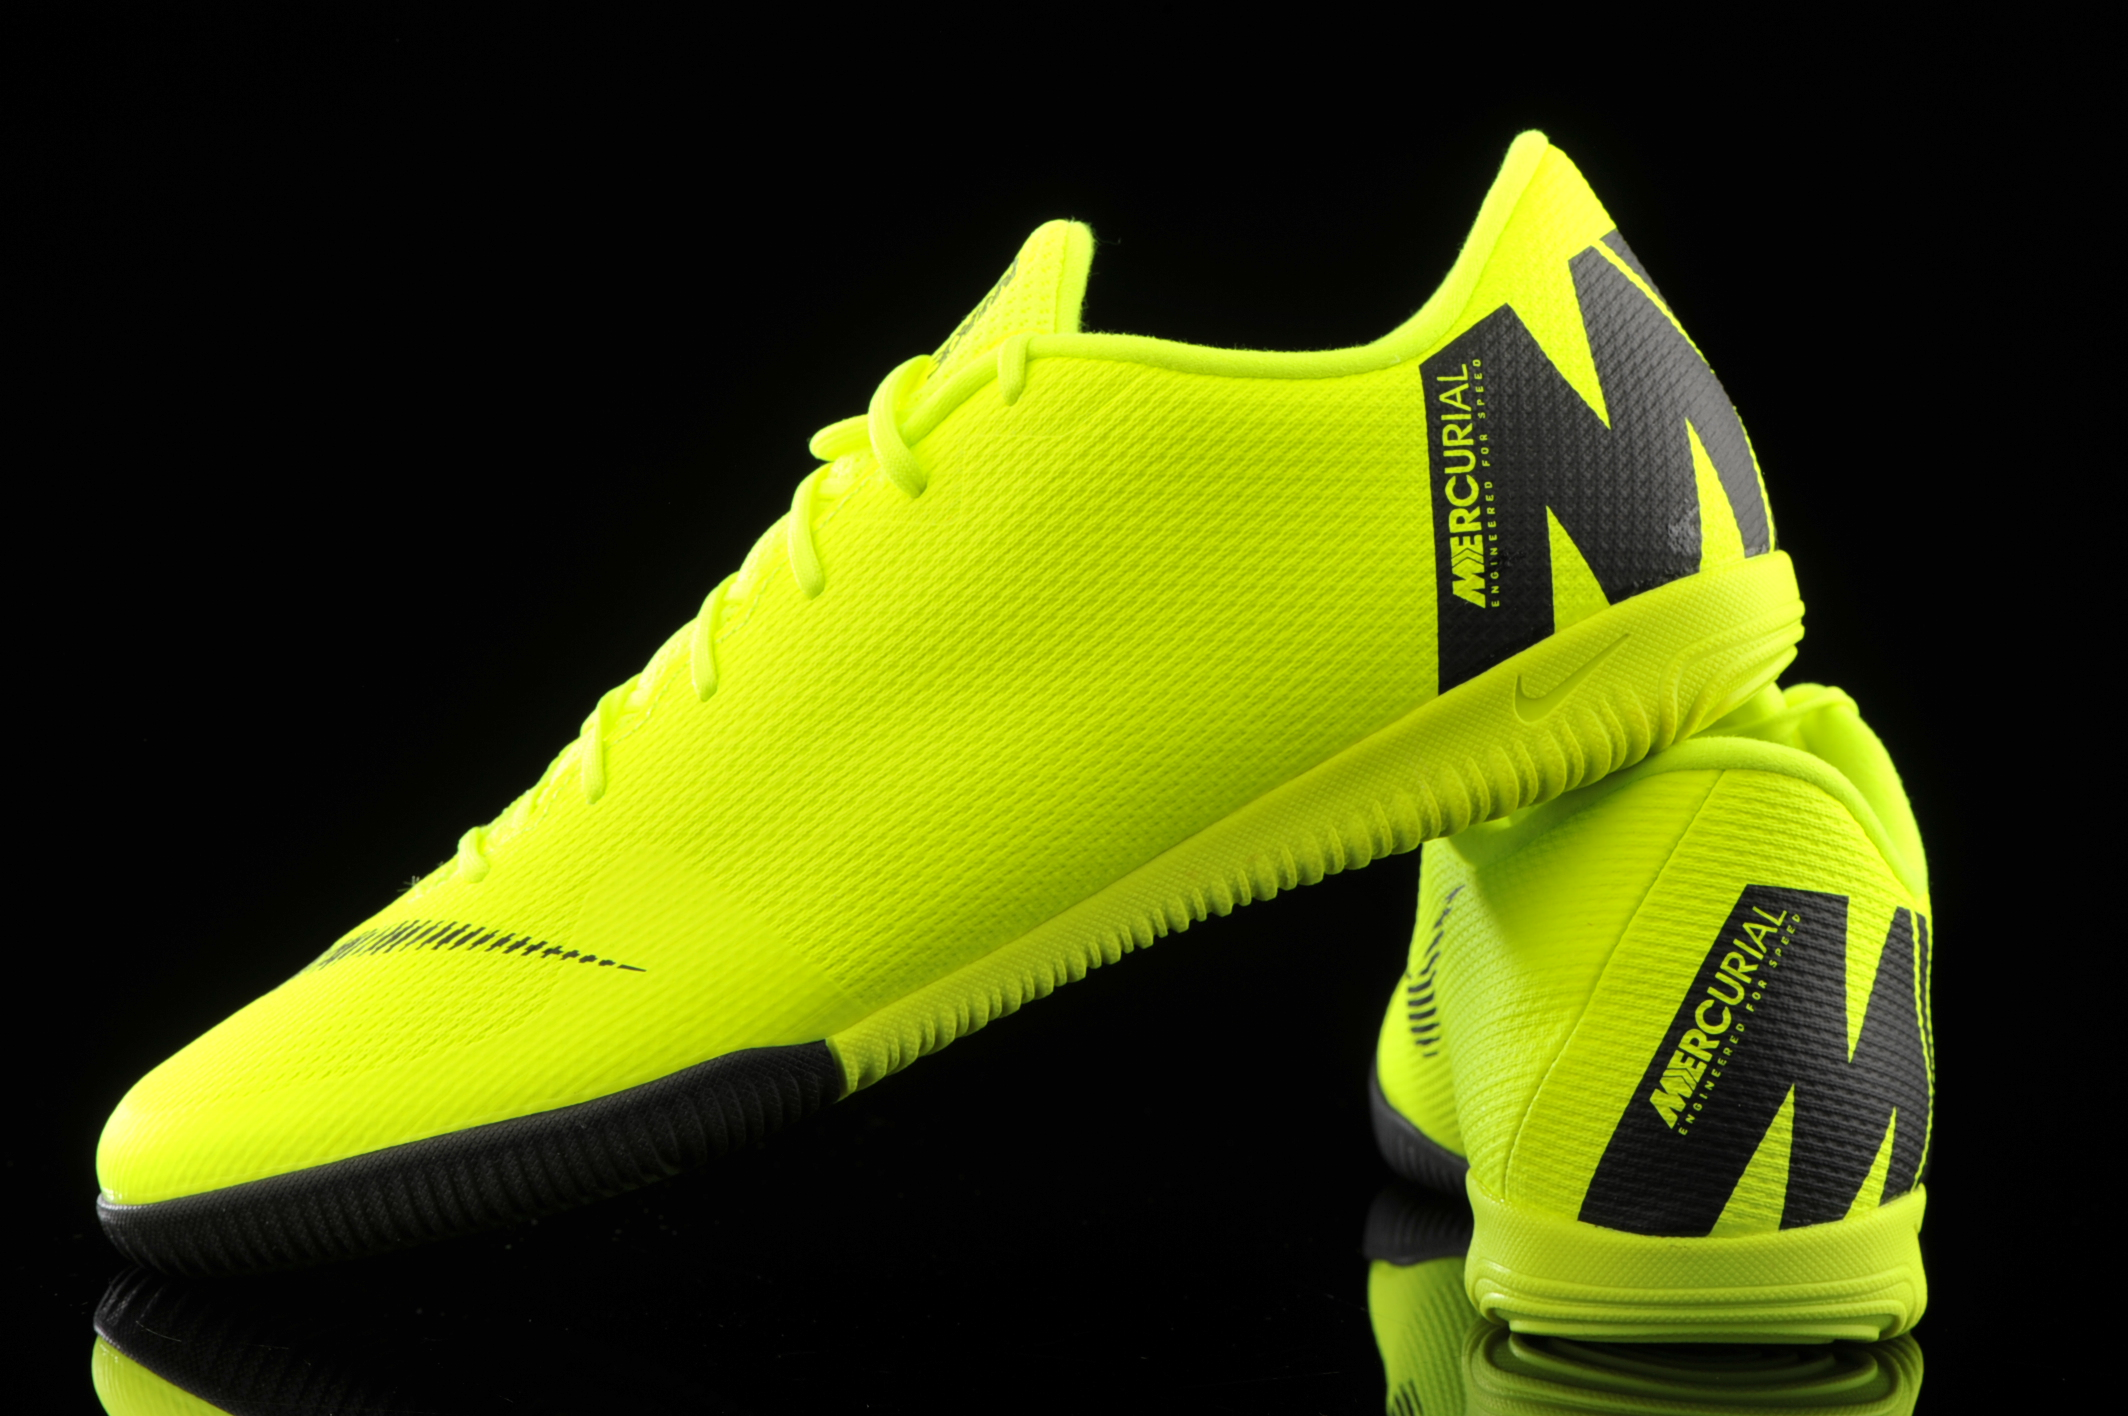 Contratista desinfectar Dureza  Nike Vapor 12 Academy IC AH7383-701 | R-GOL.com - Football boots & equipment